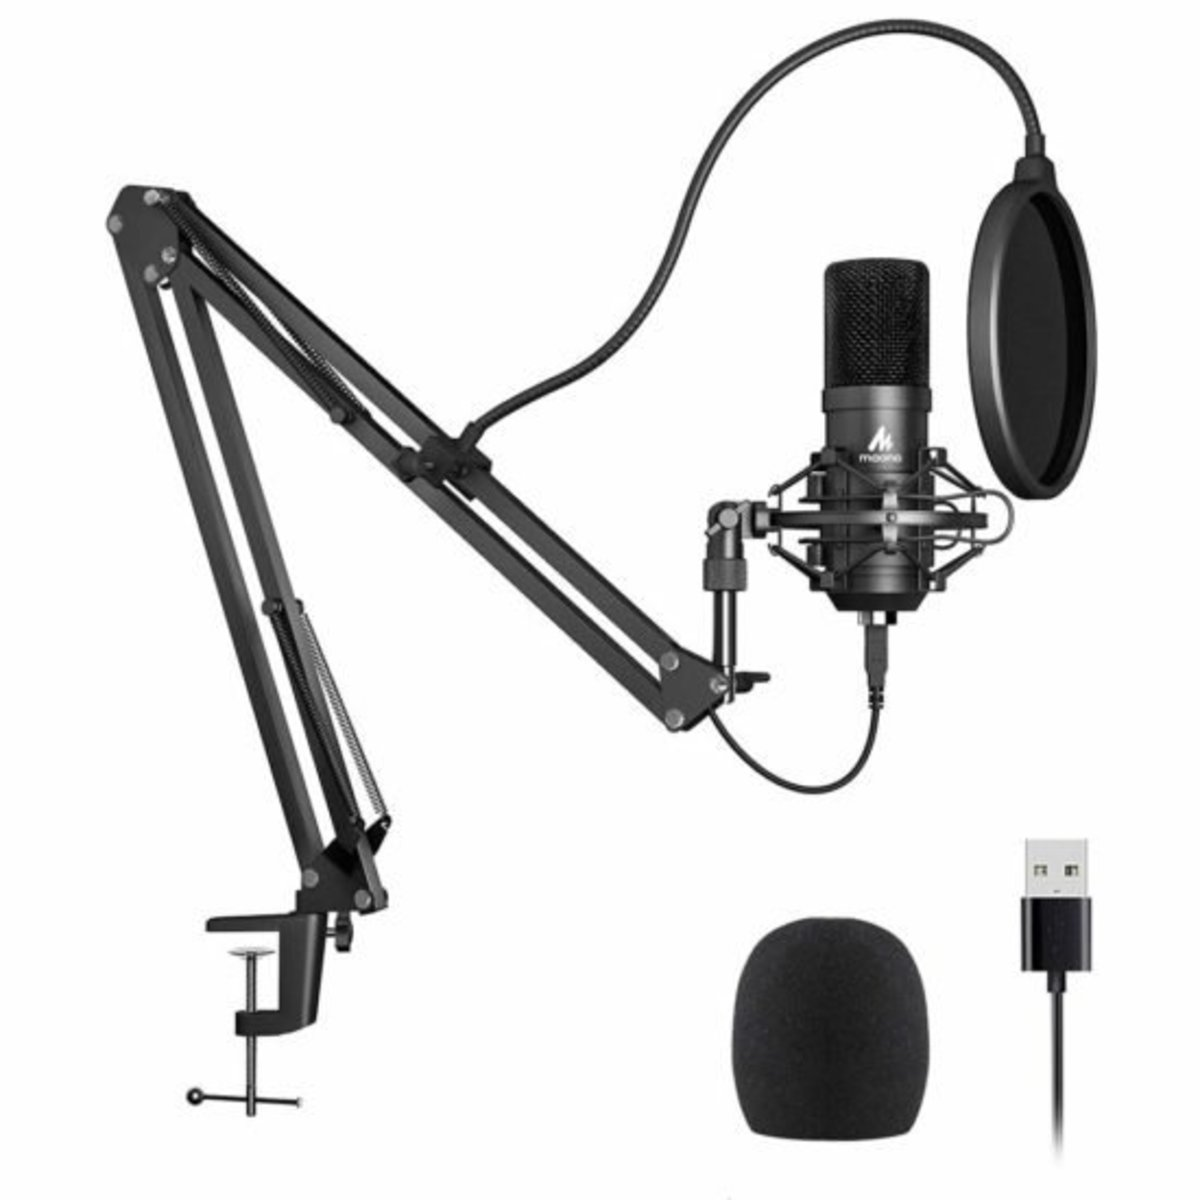 USB Microphone Podcast Kit Studio Set[AU-A04]